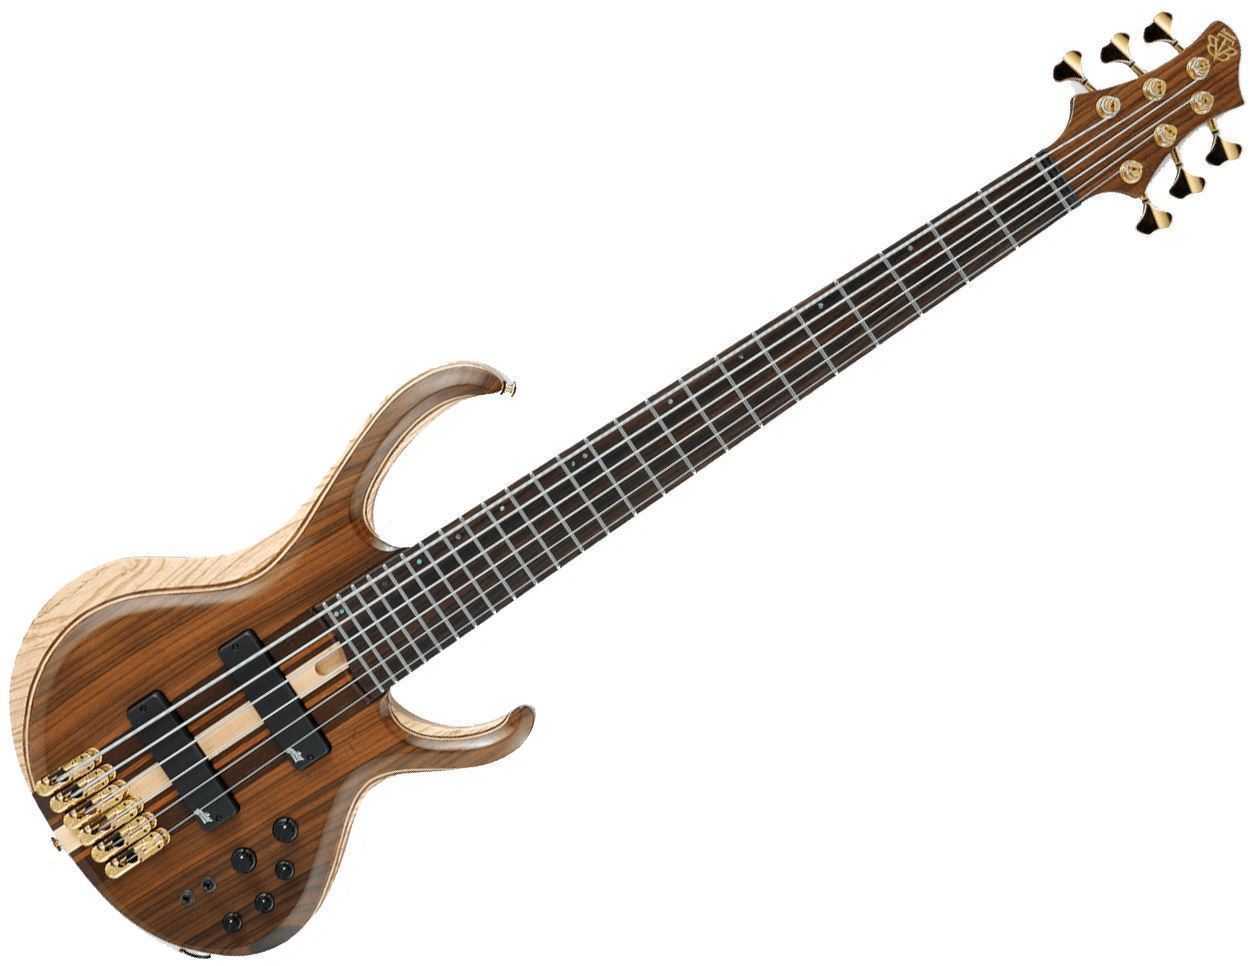 ibanez btb1806 6 string bass guitar natural low gloss perth mega music online. Black Bedroom Furniture Sets. Home Design Ideas